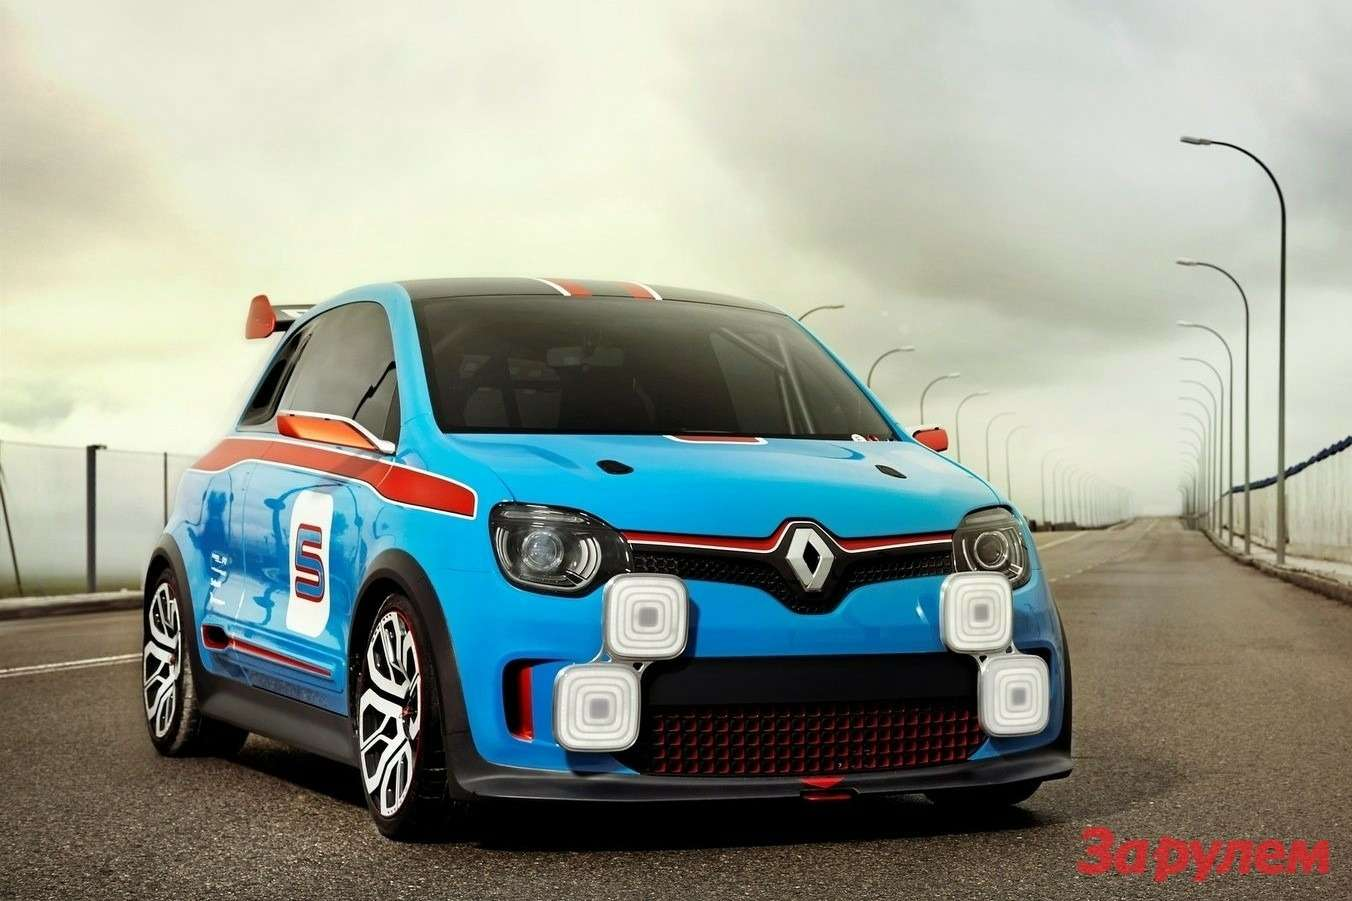 Renault Twin Run Concept 2013 1600x1200 wallpaper 02